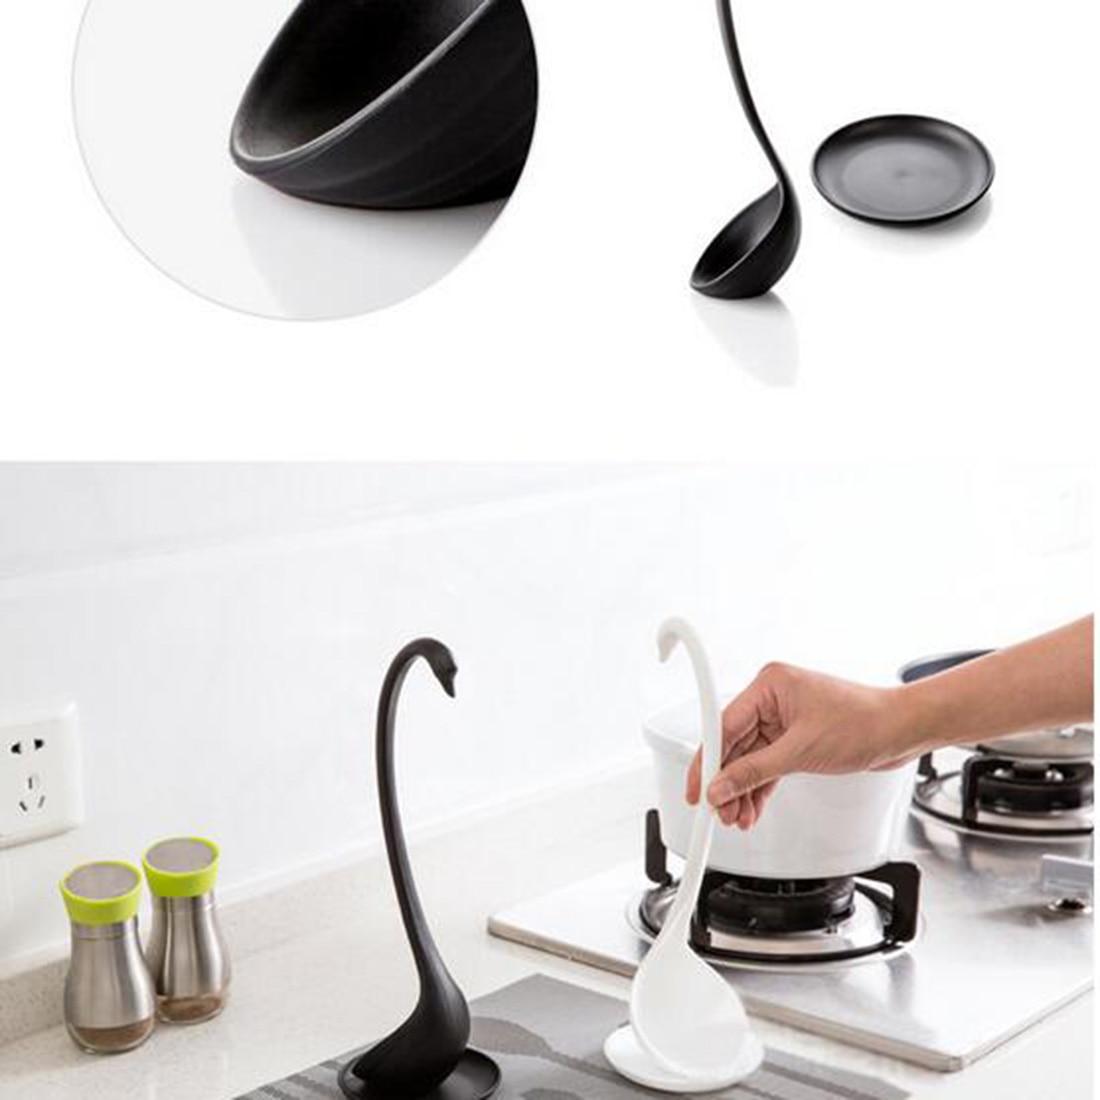 cute kitchen gadgets slim storage innovation utensils creative swan soup spoon with